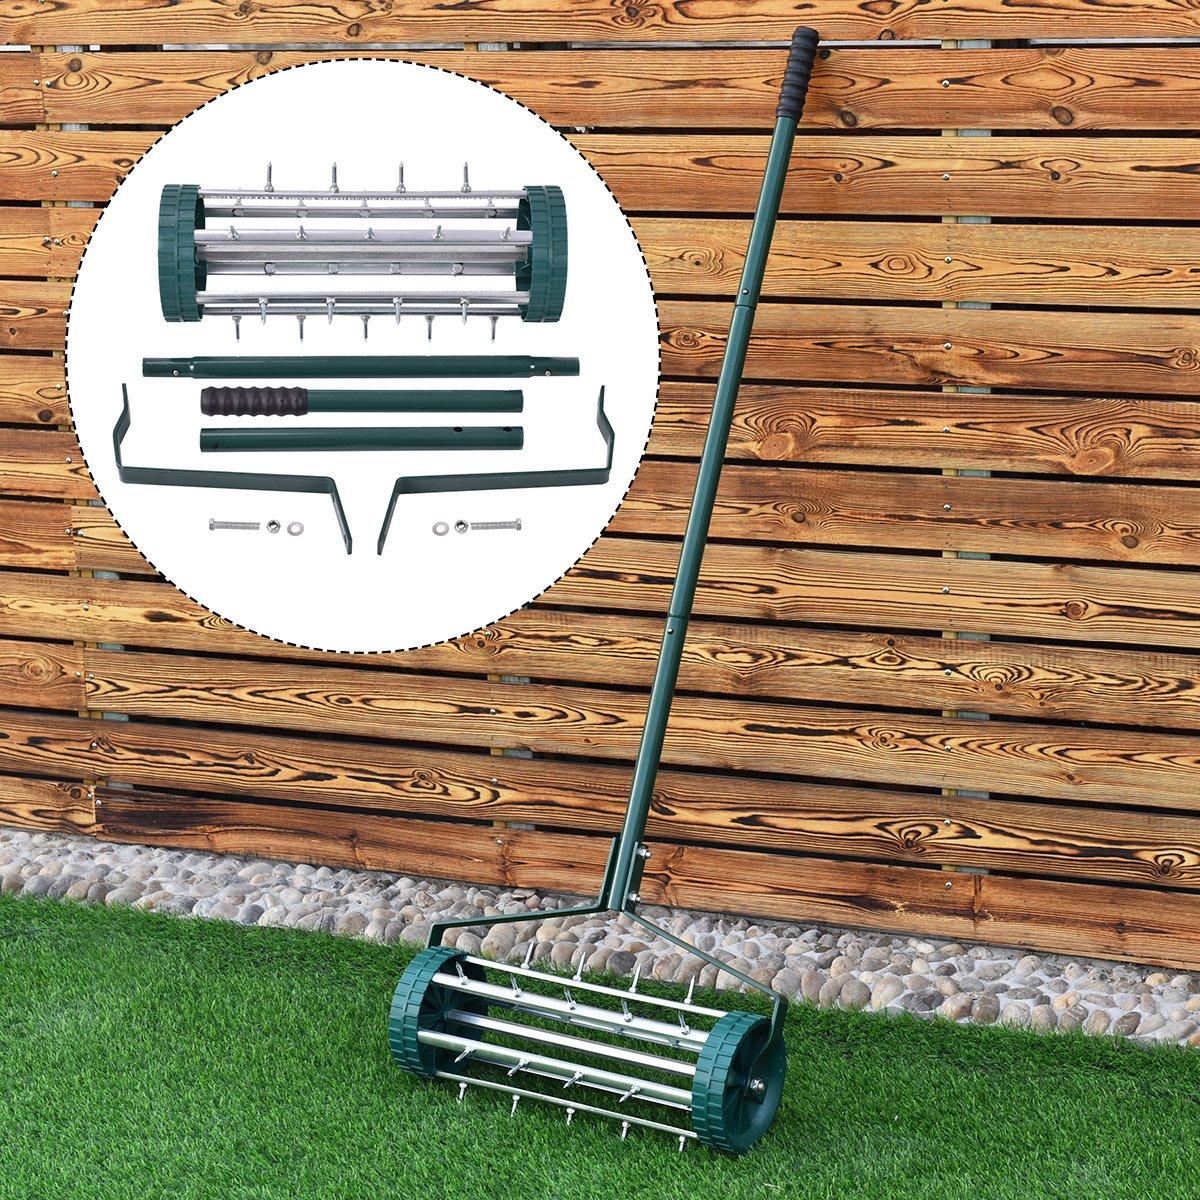 CASART Grass Spike Roller Heavy Duty Garden Tool Lawn Handle Outdoor